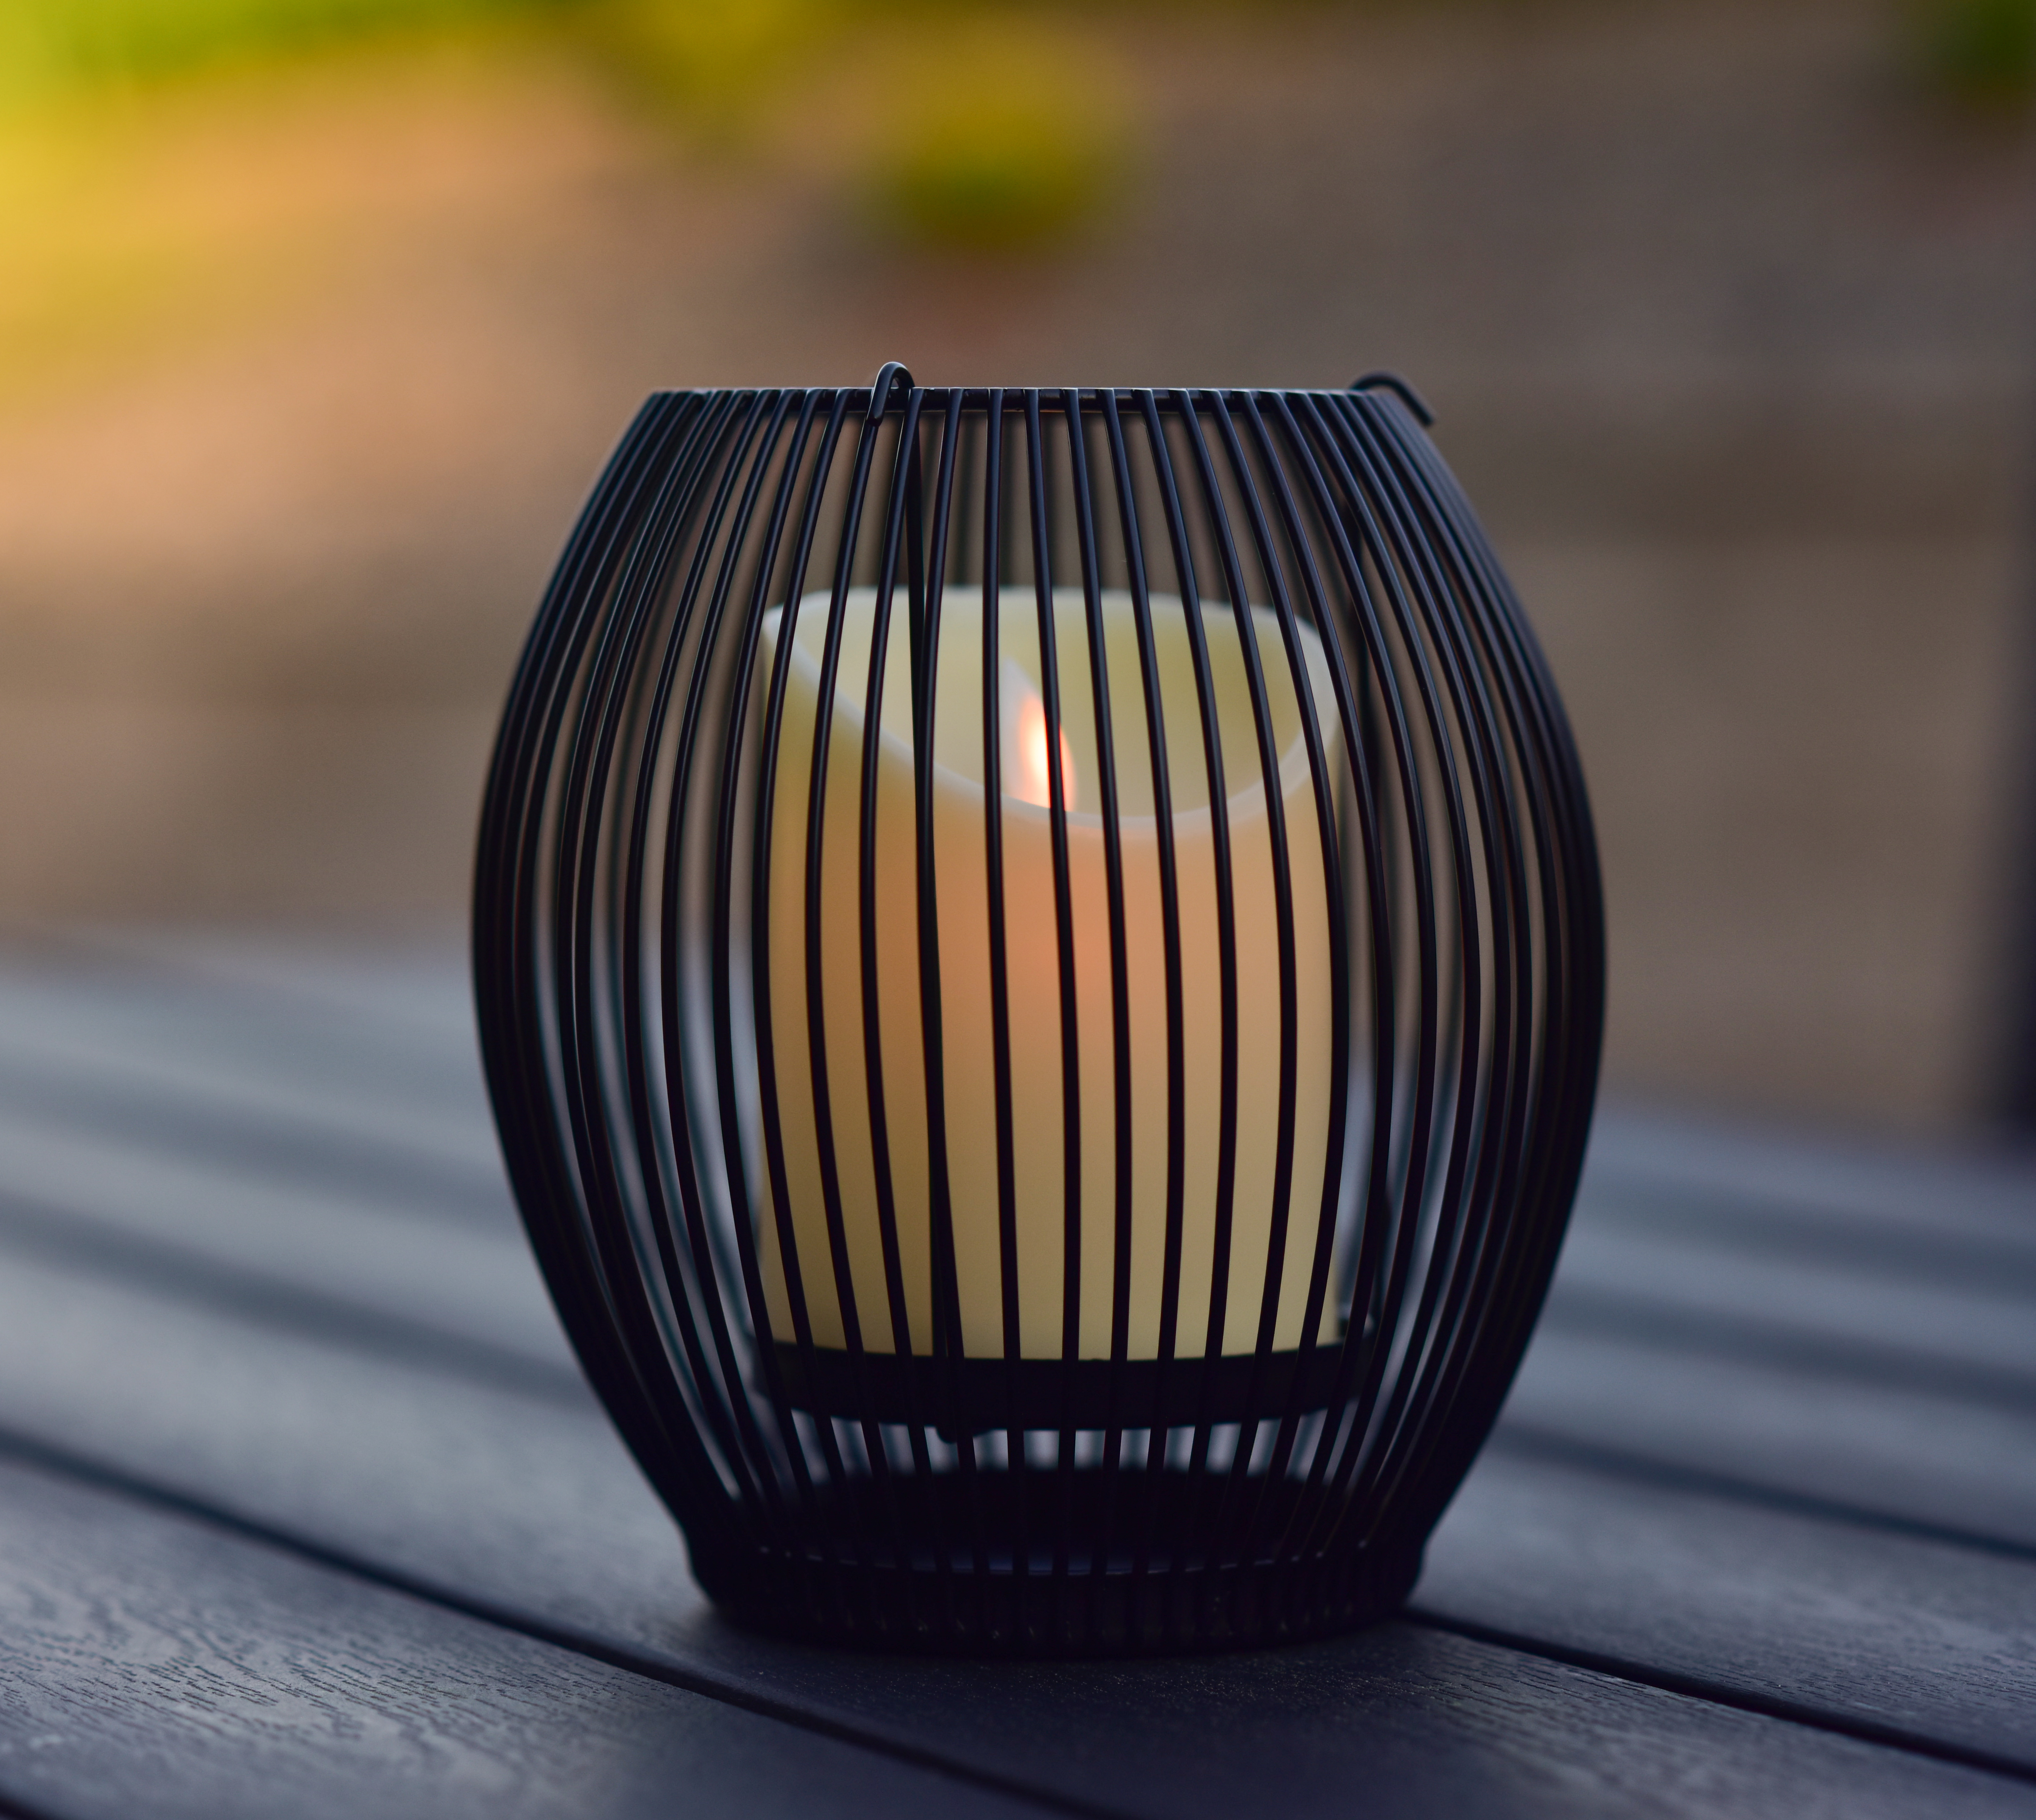 Kovový svícen mřížkovaný černý